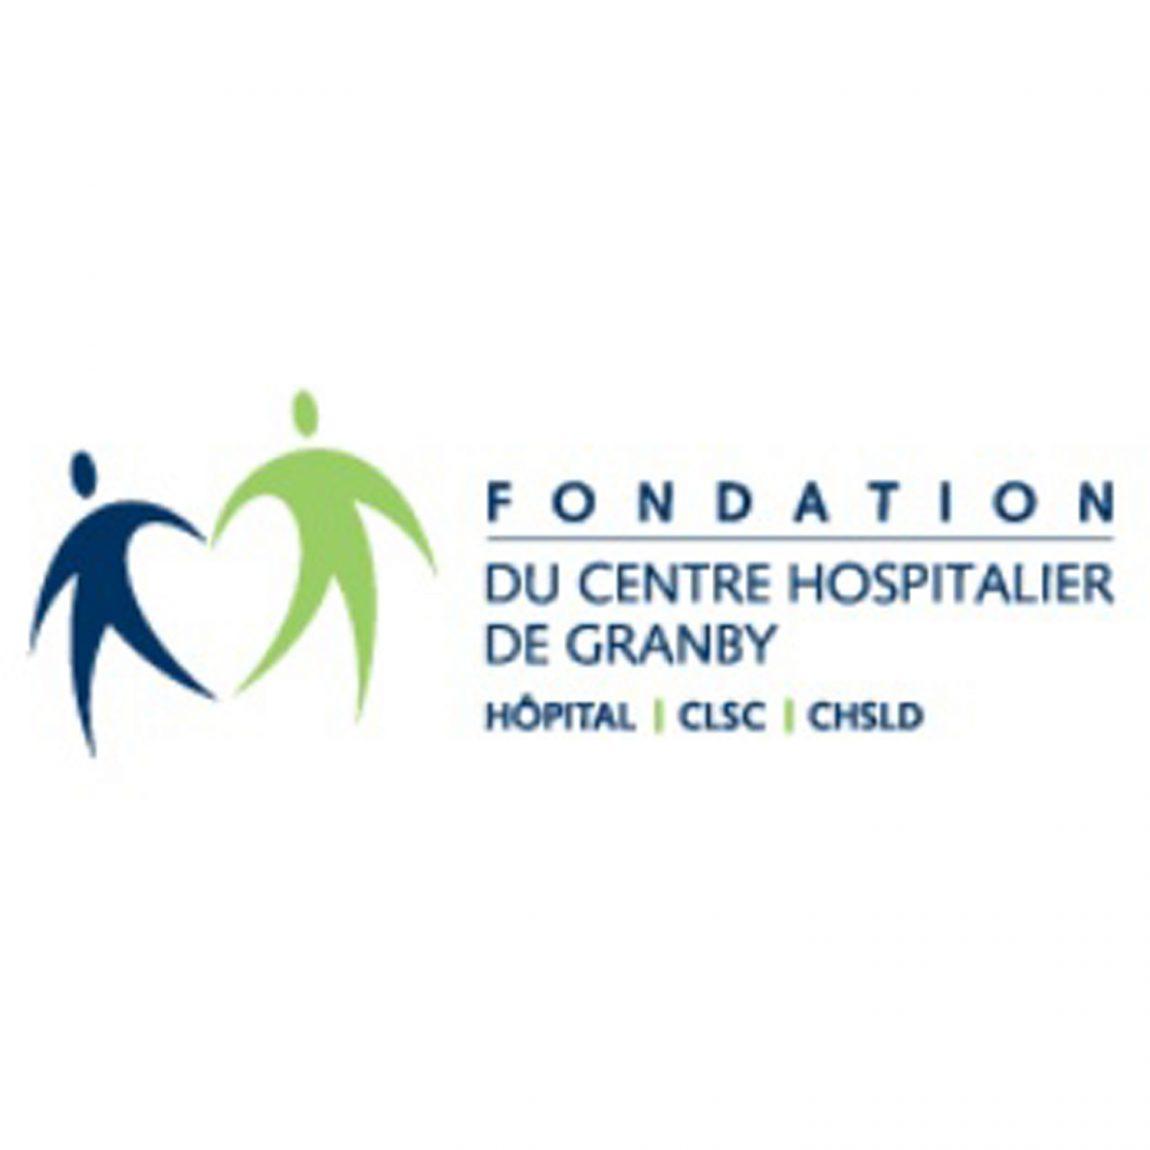 Fondation-CHG.jpg